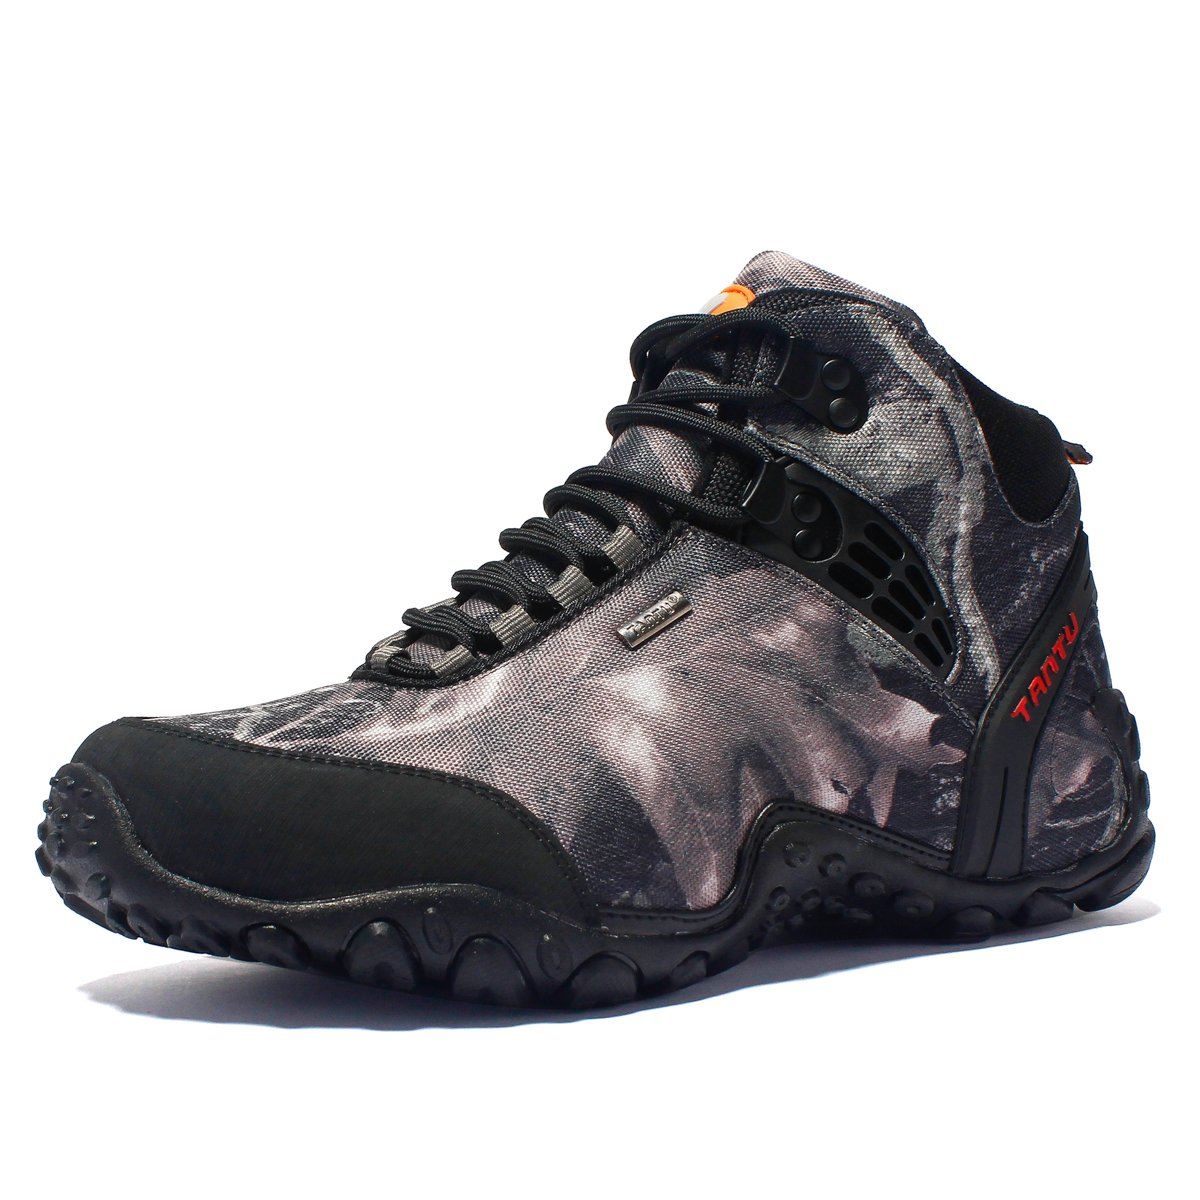 99aab964a3e Amazon.com | GOMNEAR Men Hiking Boots Trekking Shoes Outdoor Sport ...